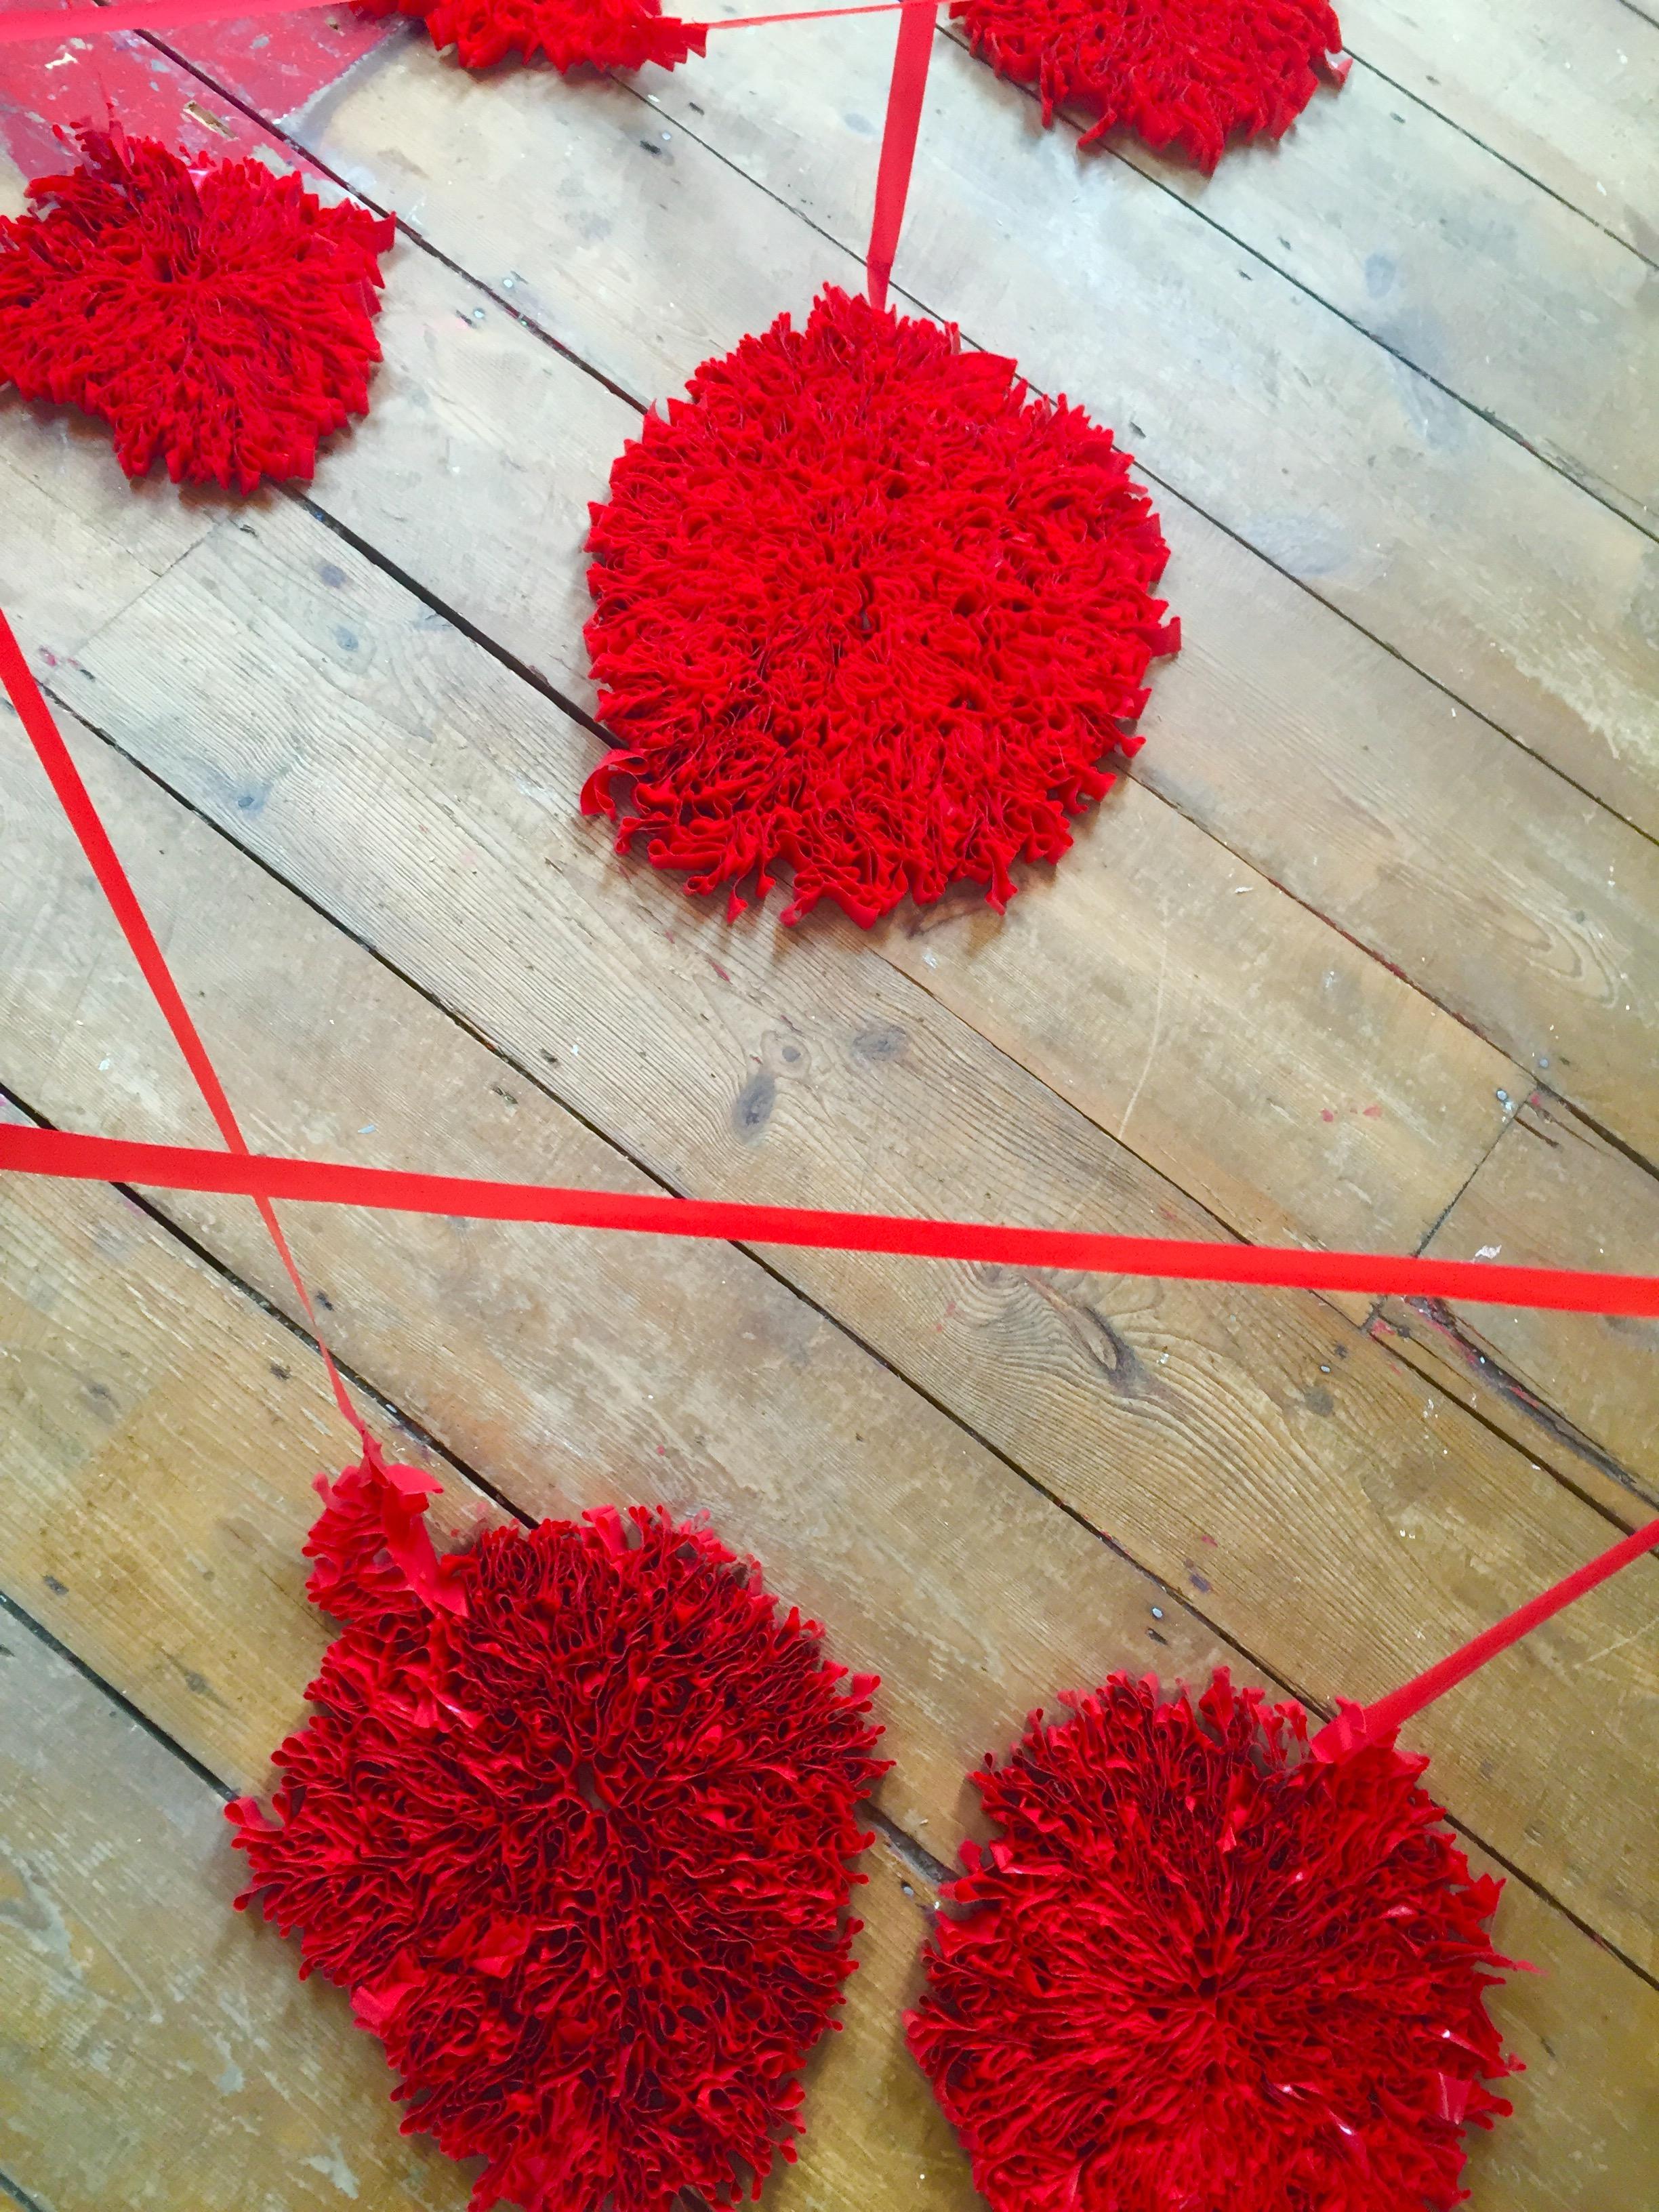 2016-cartesiancut-Nikki-Allford-Red-Pools-Absence:Presence.jpg